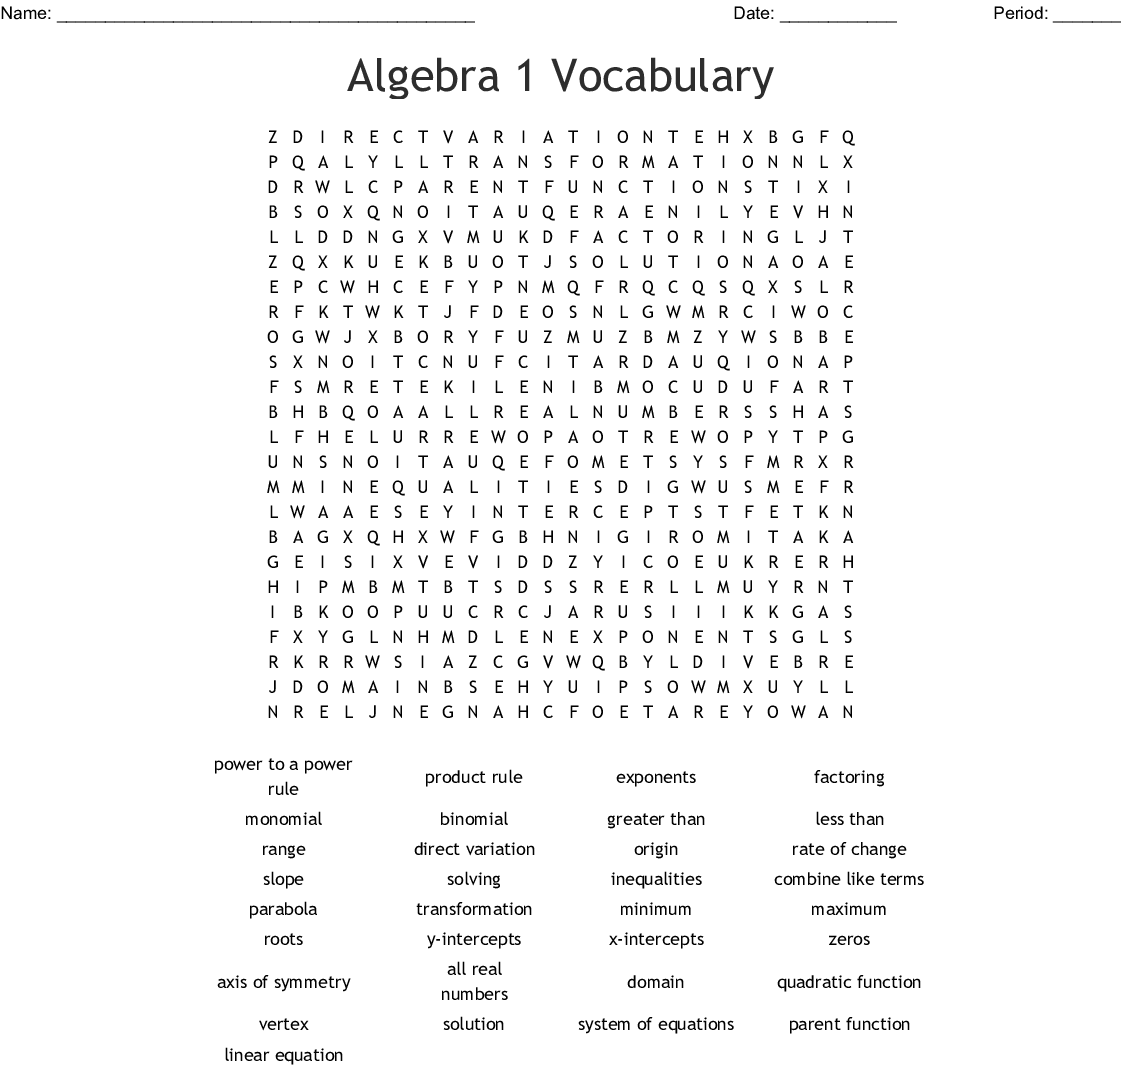 Algebra 1 Vocabulary Word Search